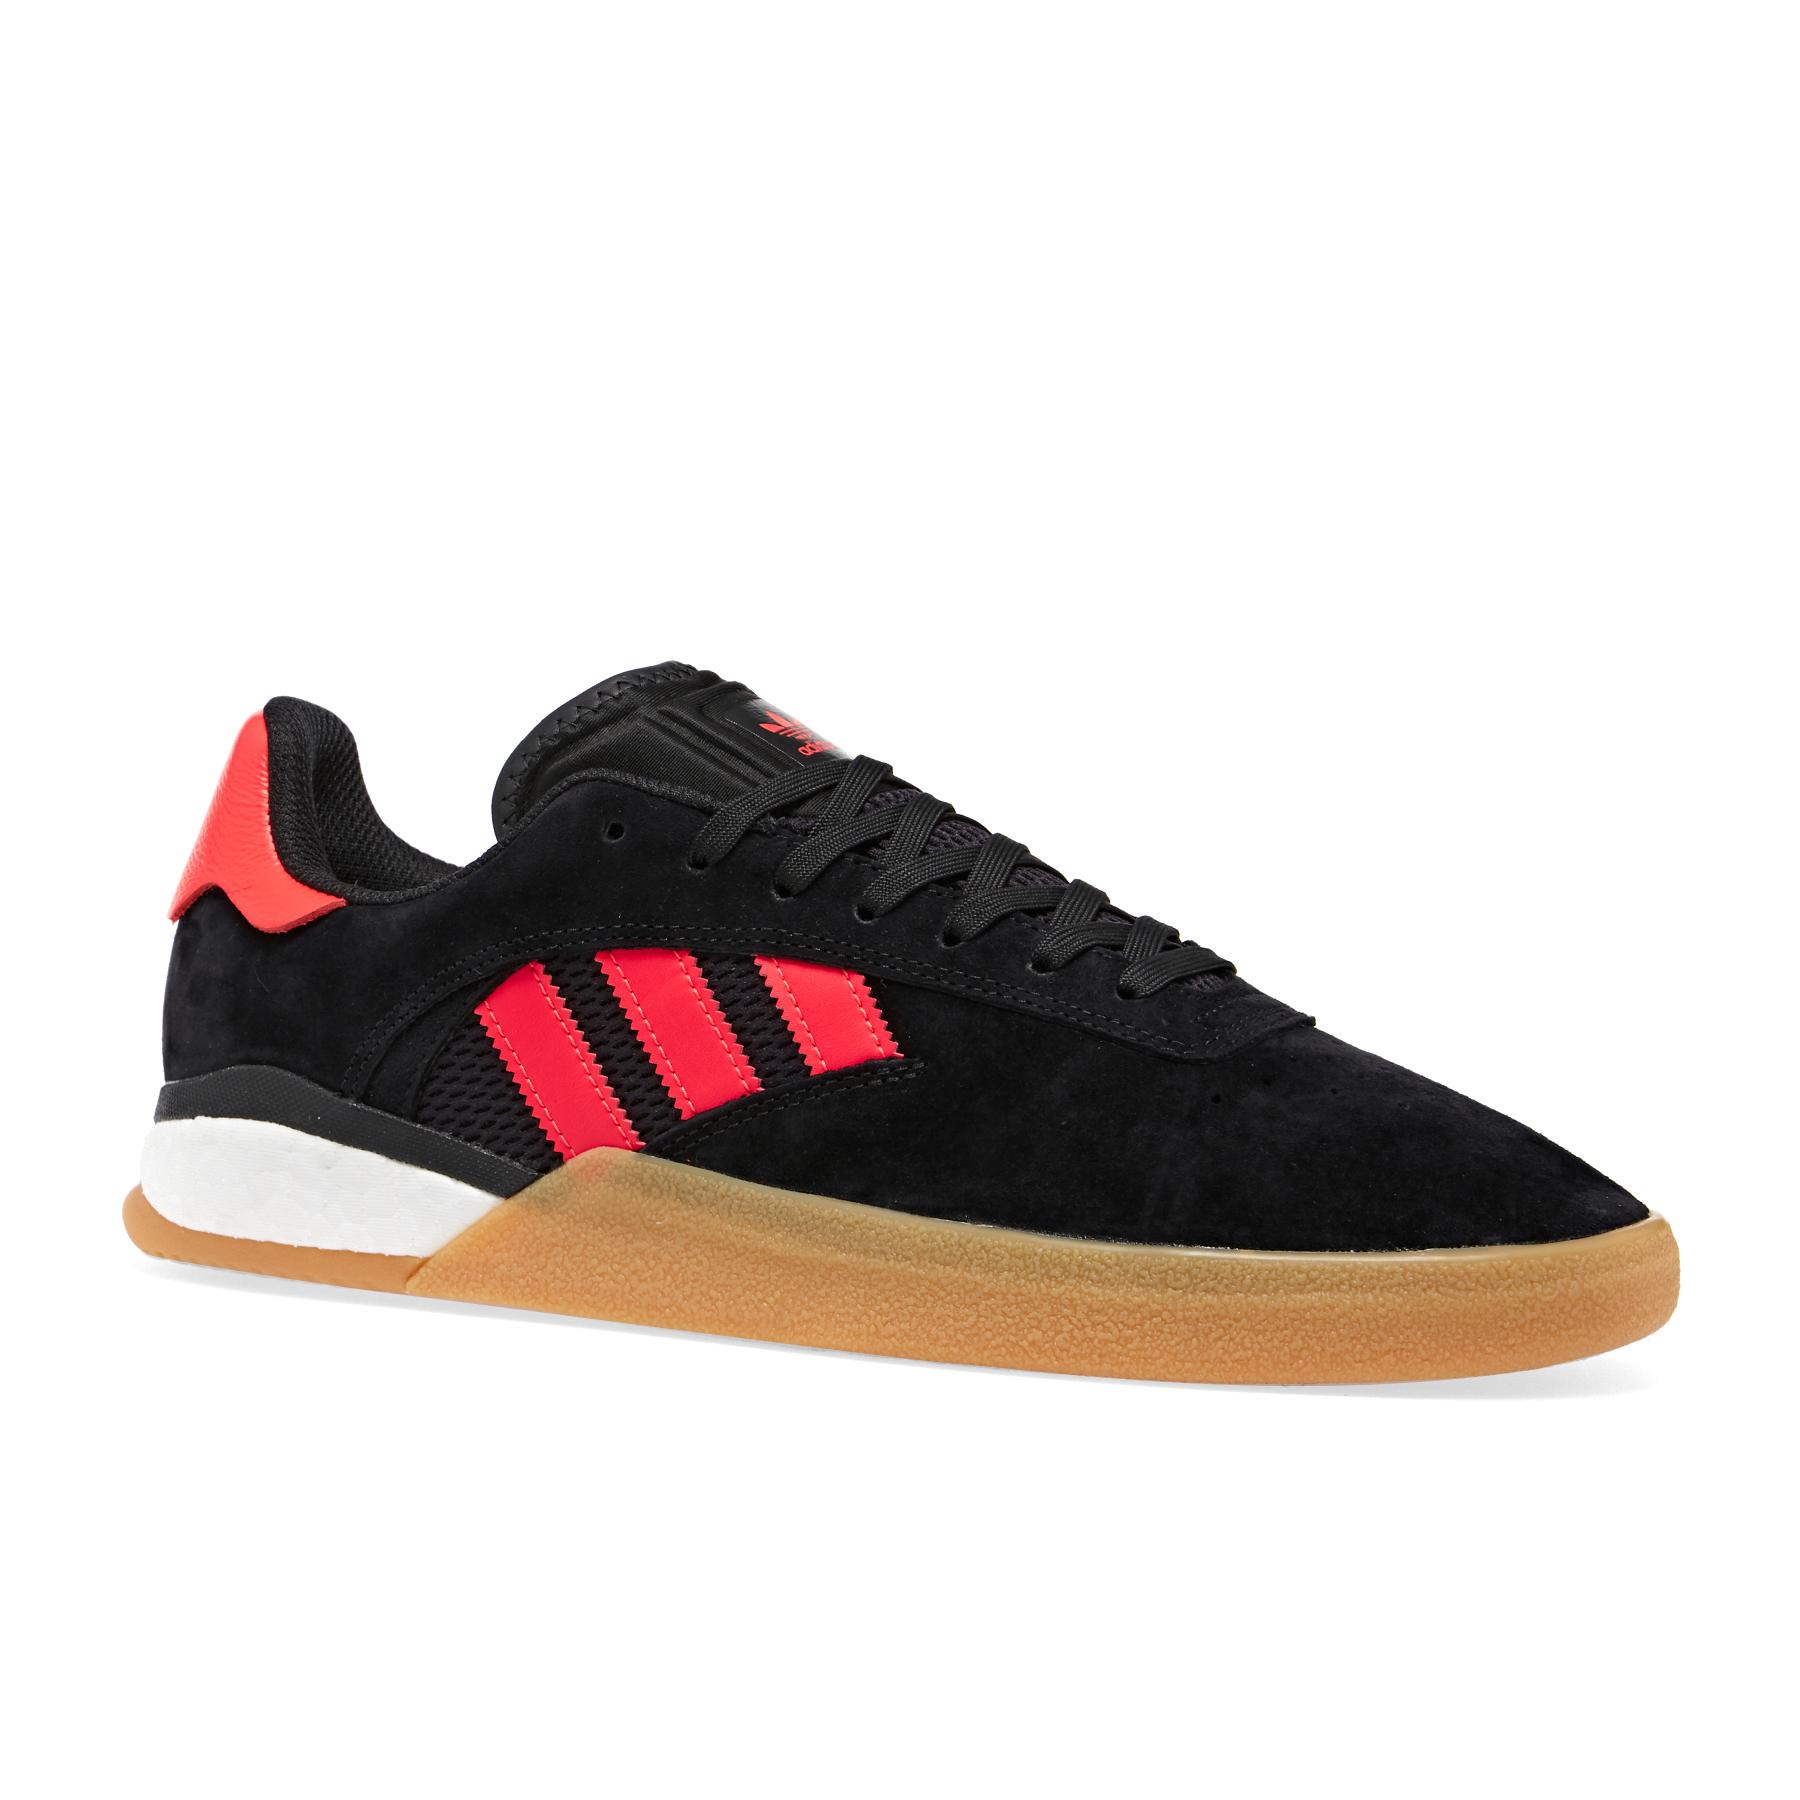 adidas Skateboarding 3ST Jacket BlackCollegiate NavyCarbon